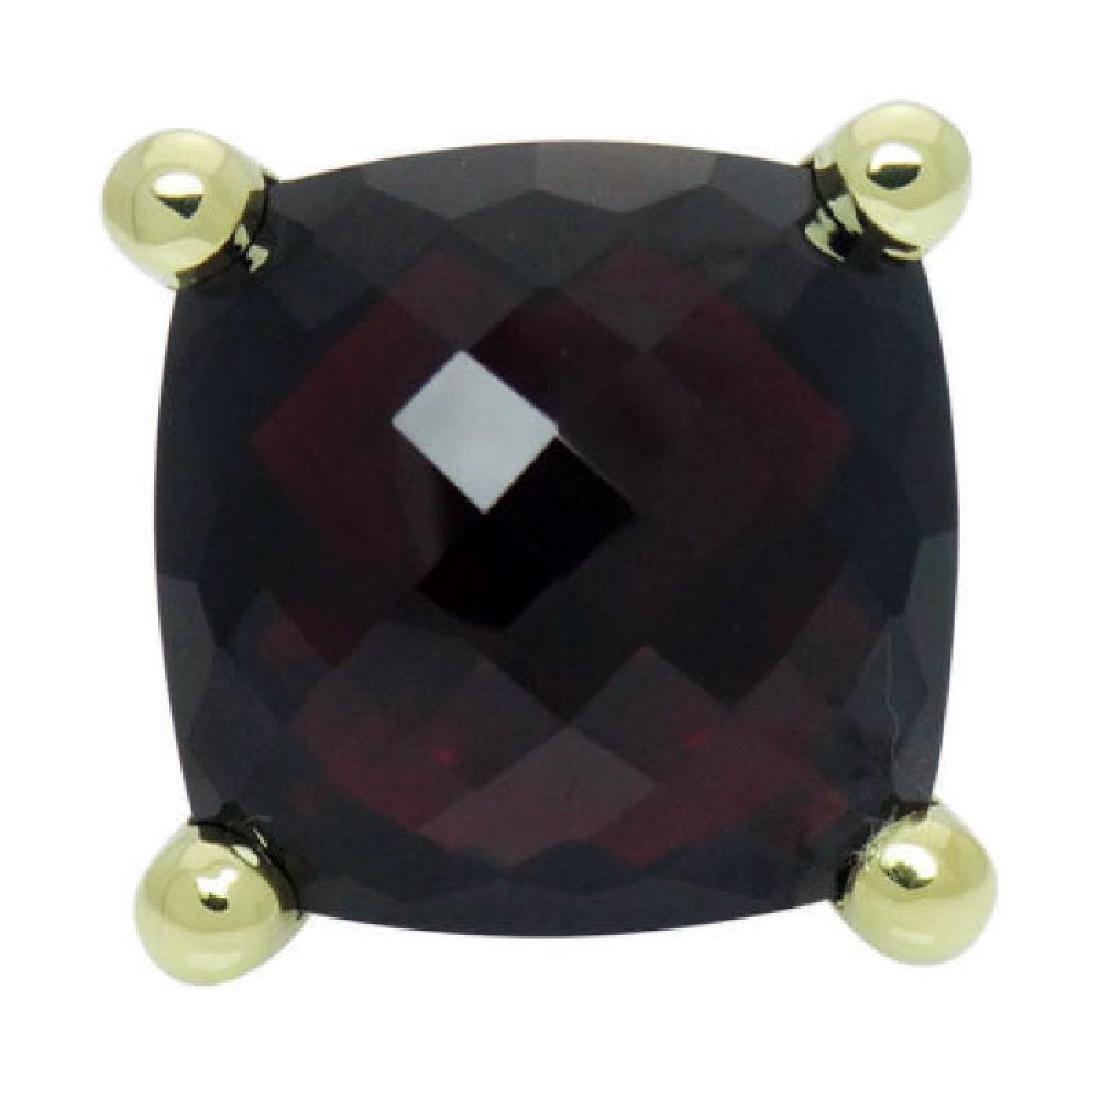 David Yurman 18k Y Gold Cushion Faceted Garnet Ring - 6